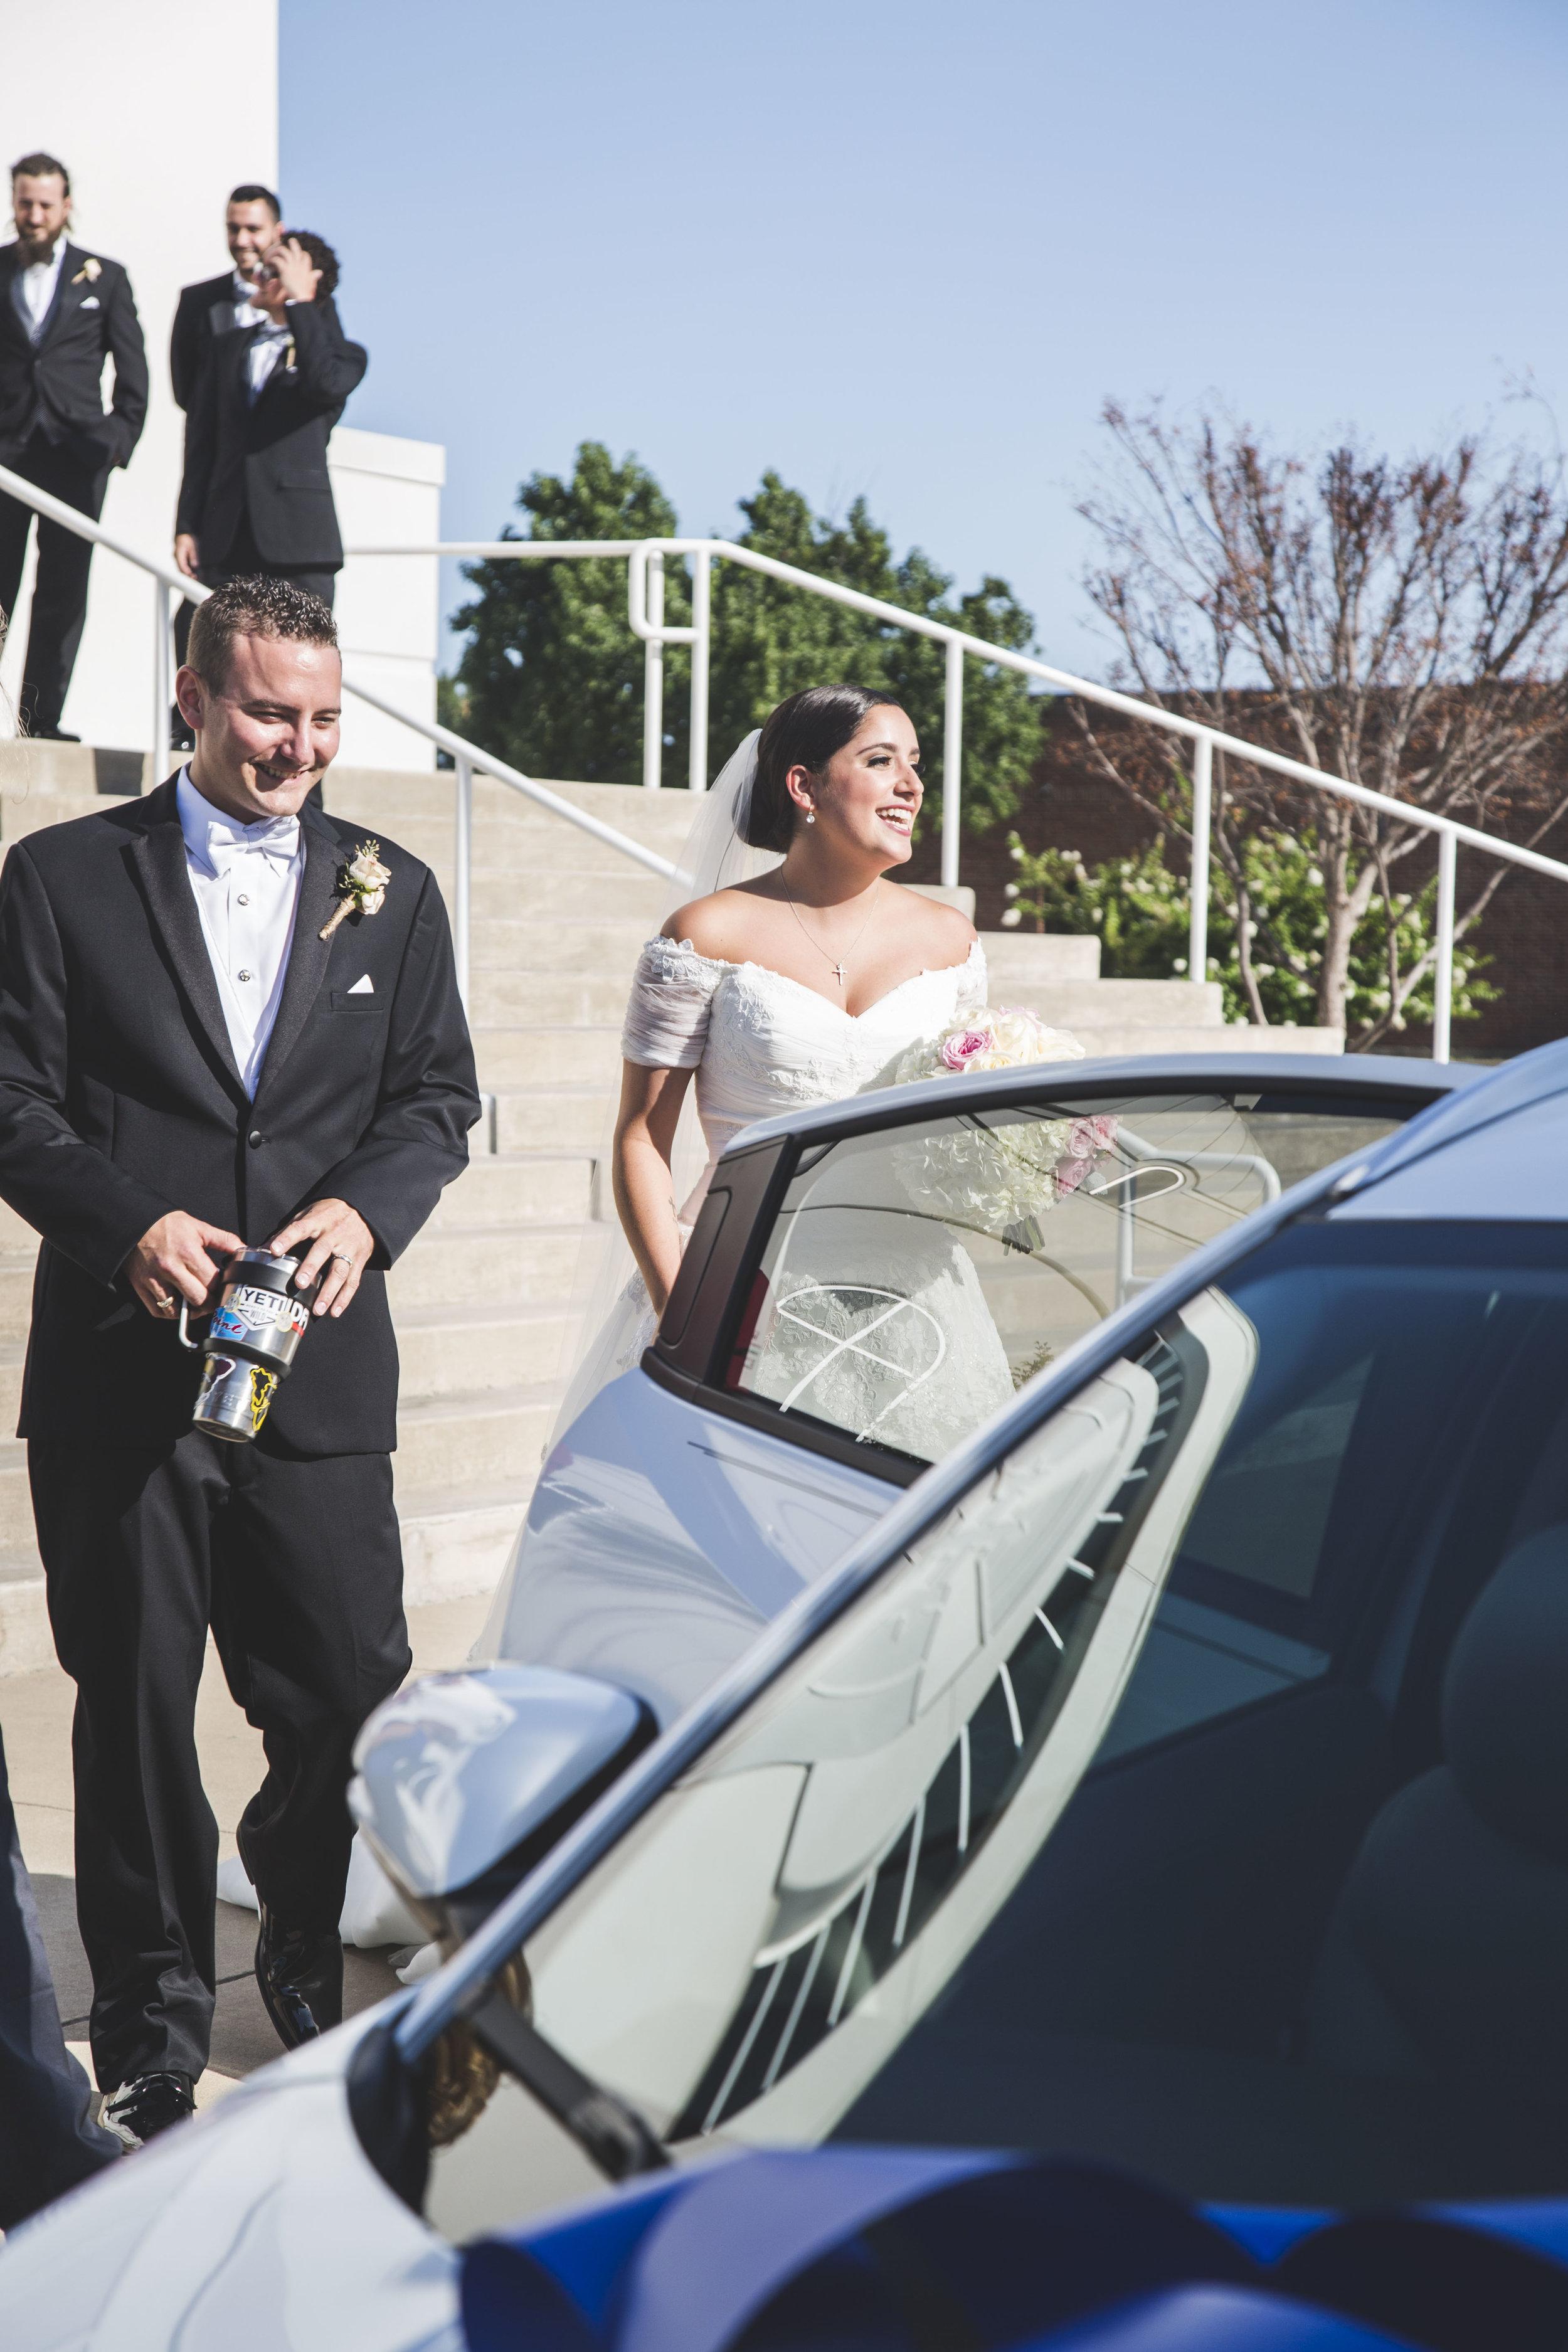 ATGI_Magali & Josh Wedding_2S8A1088.jpg